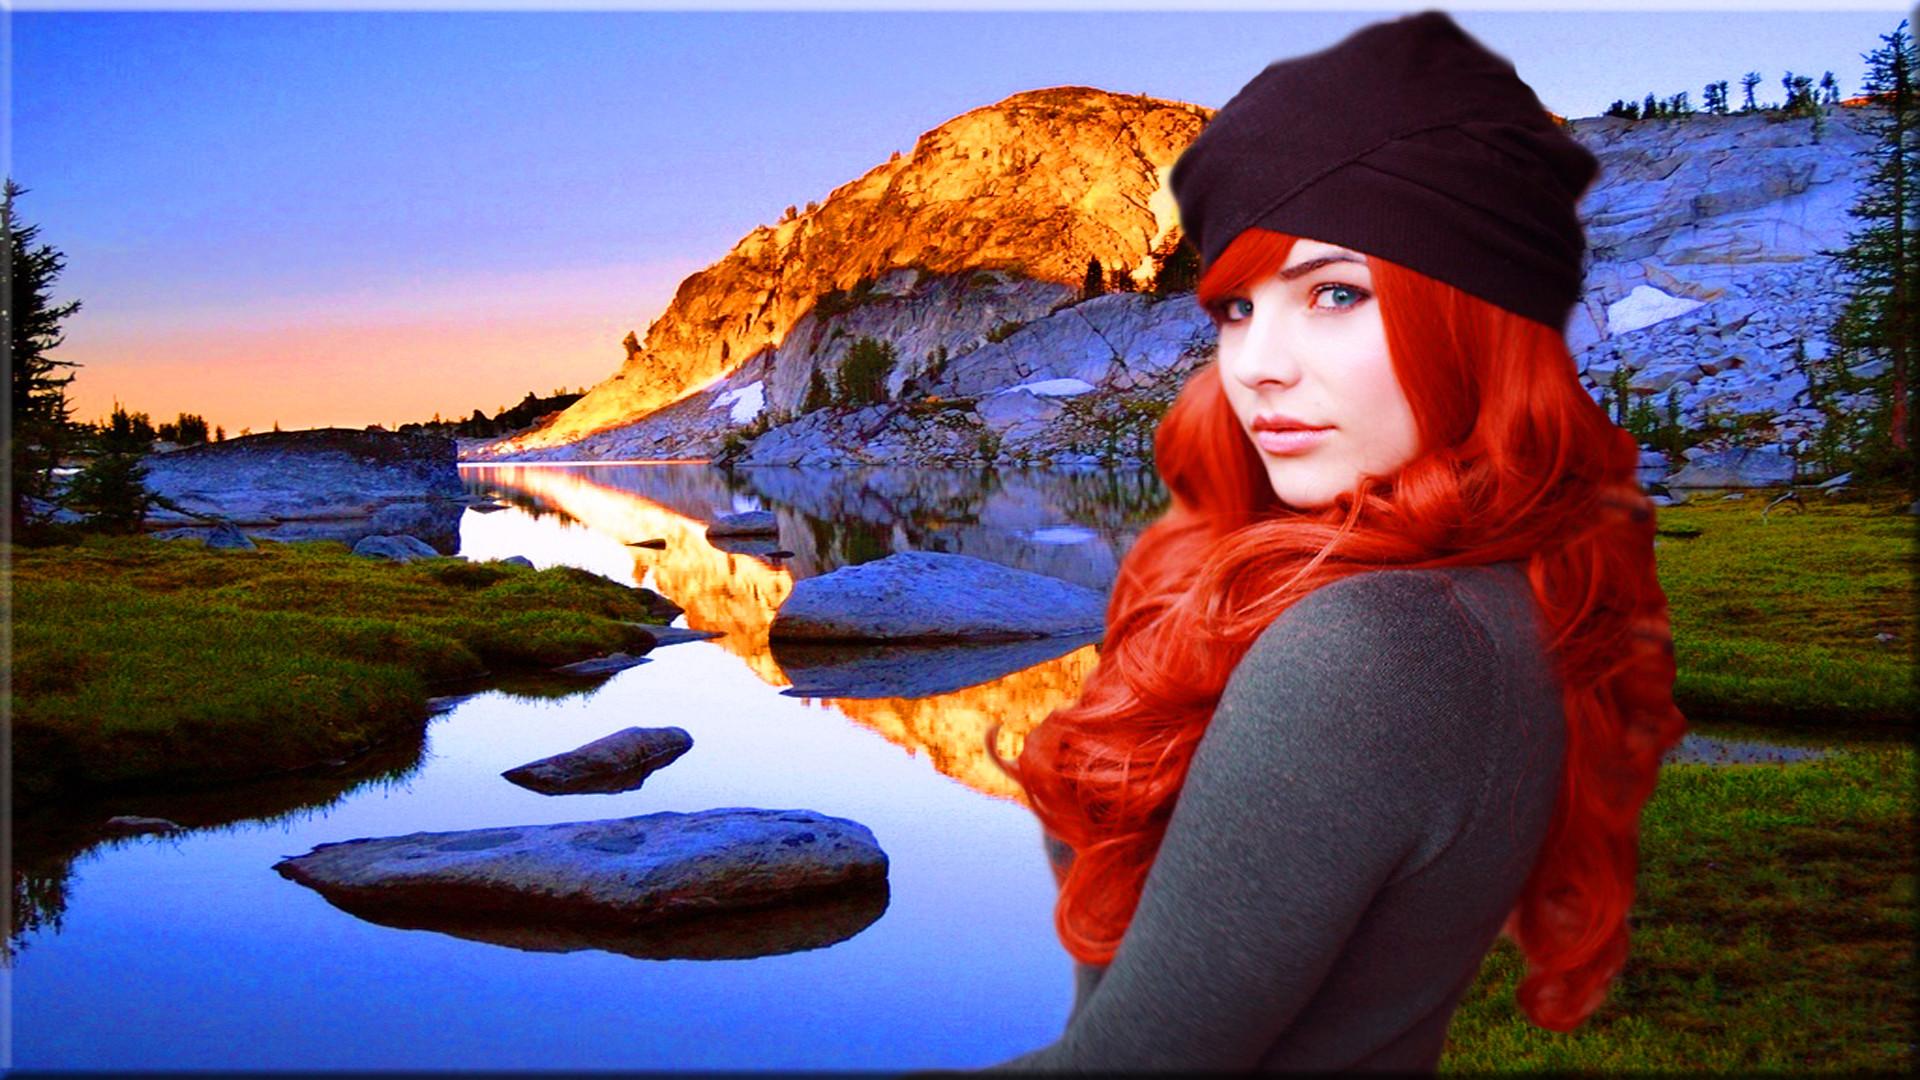 Redhead At The Mountains – Models Female Wallpaper ID 1369045 – Desktop  Nexus People Gloria Williams onto RedHeads Rule